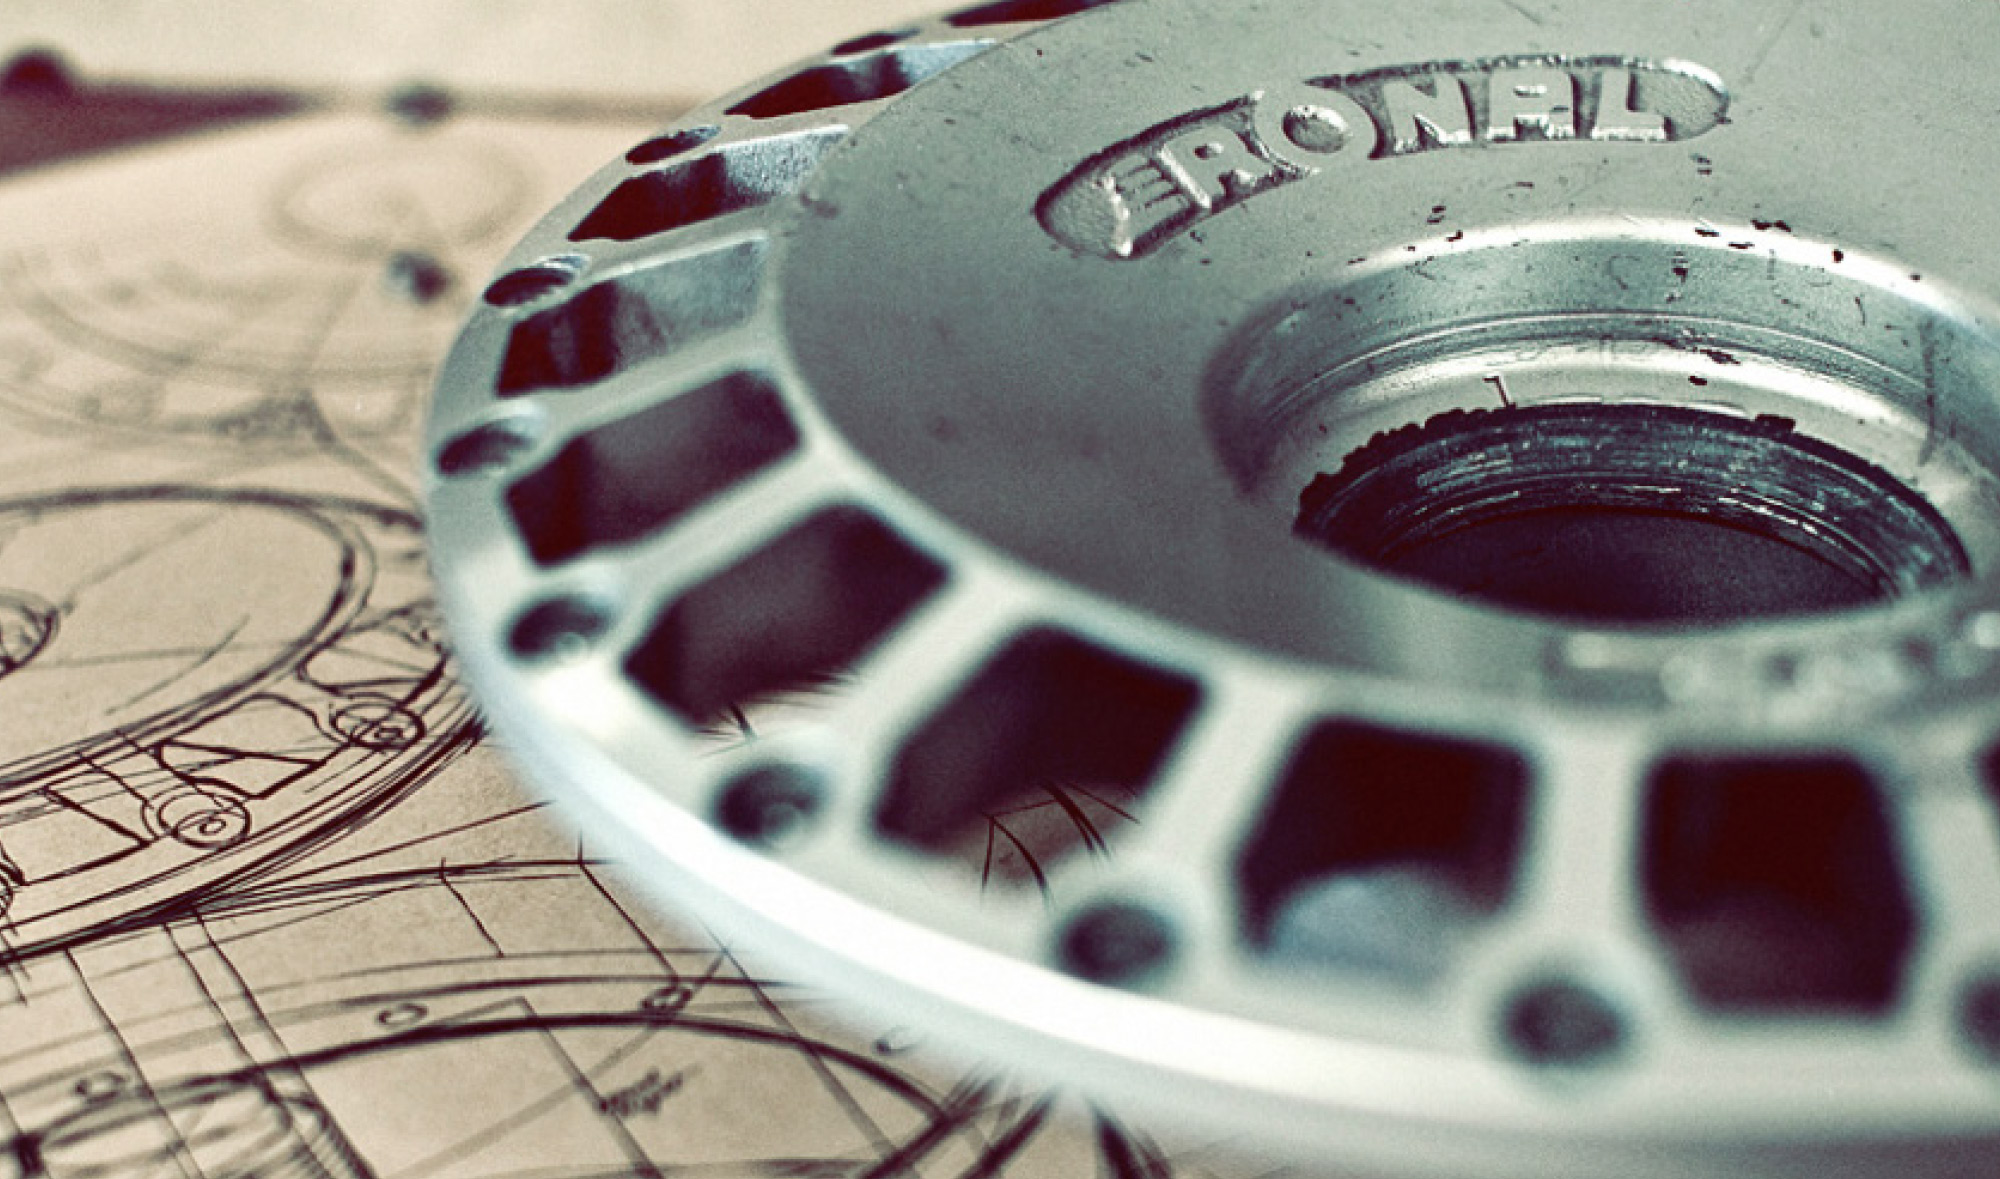 Ronal Racing Wheels Article